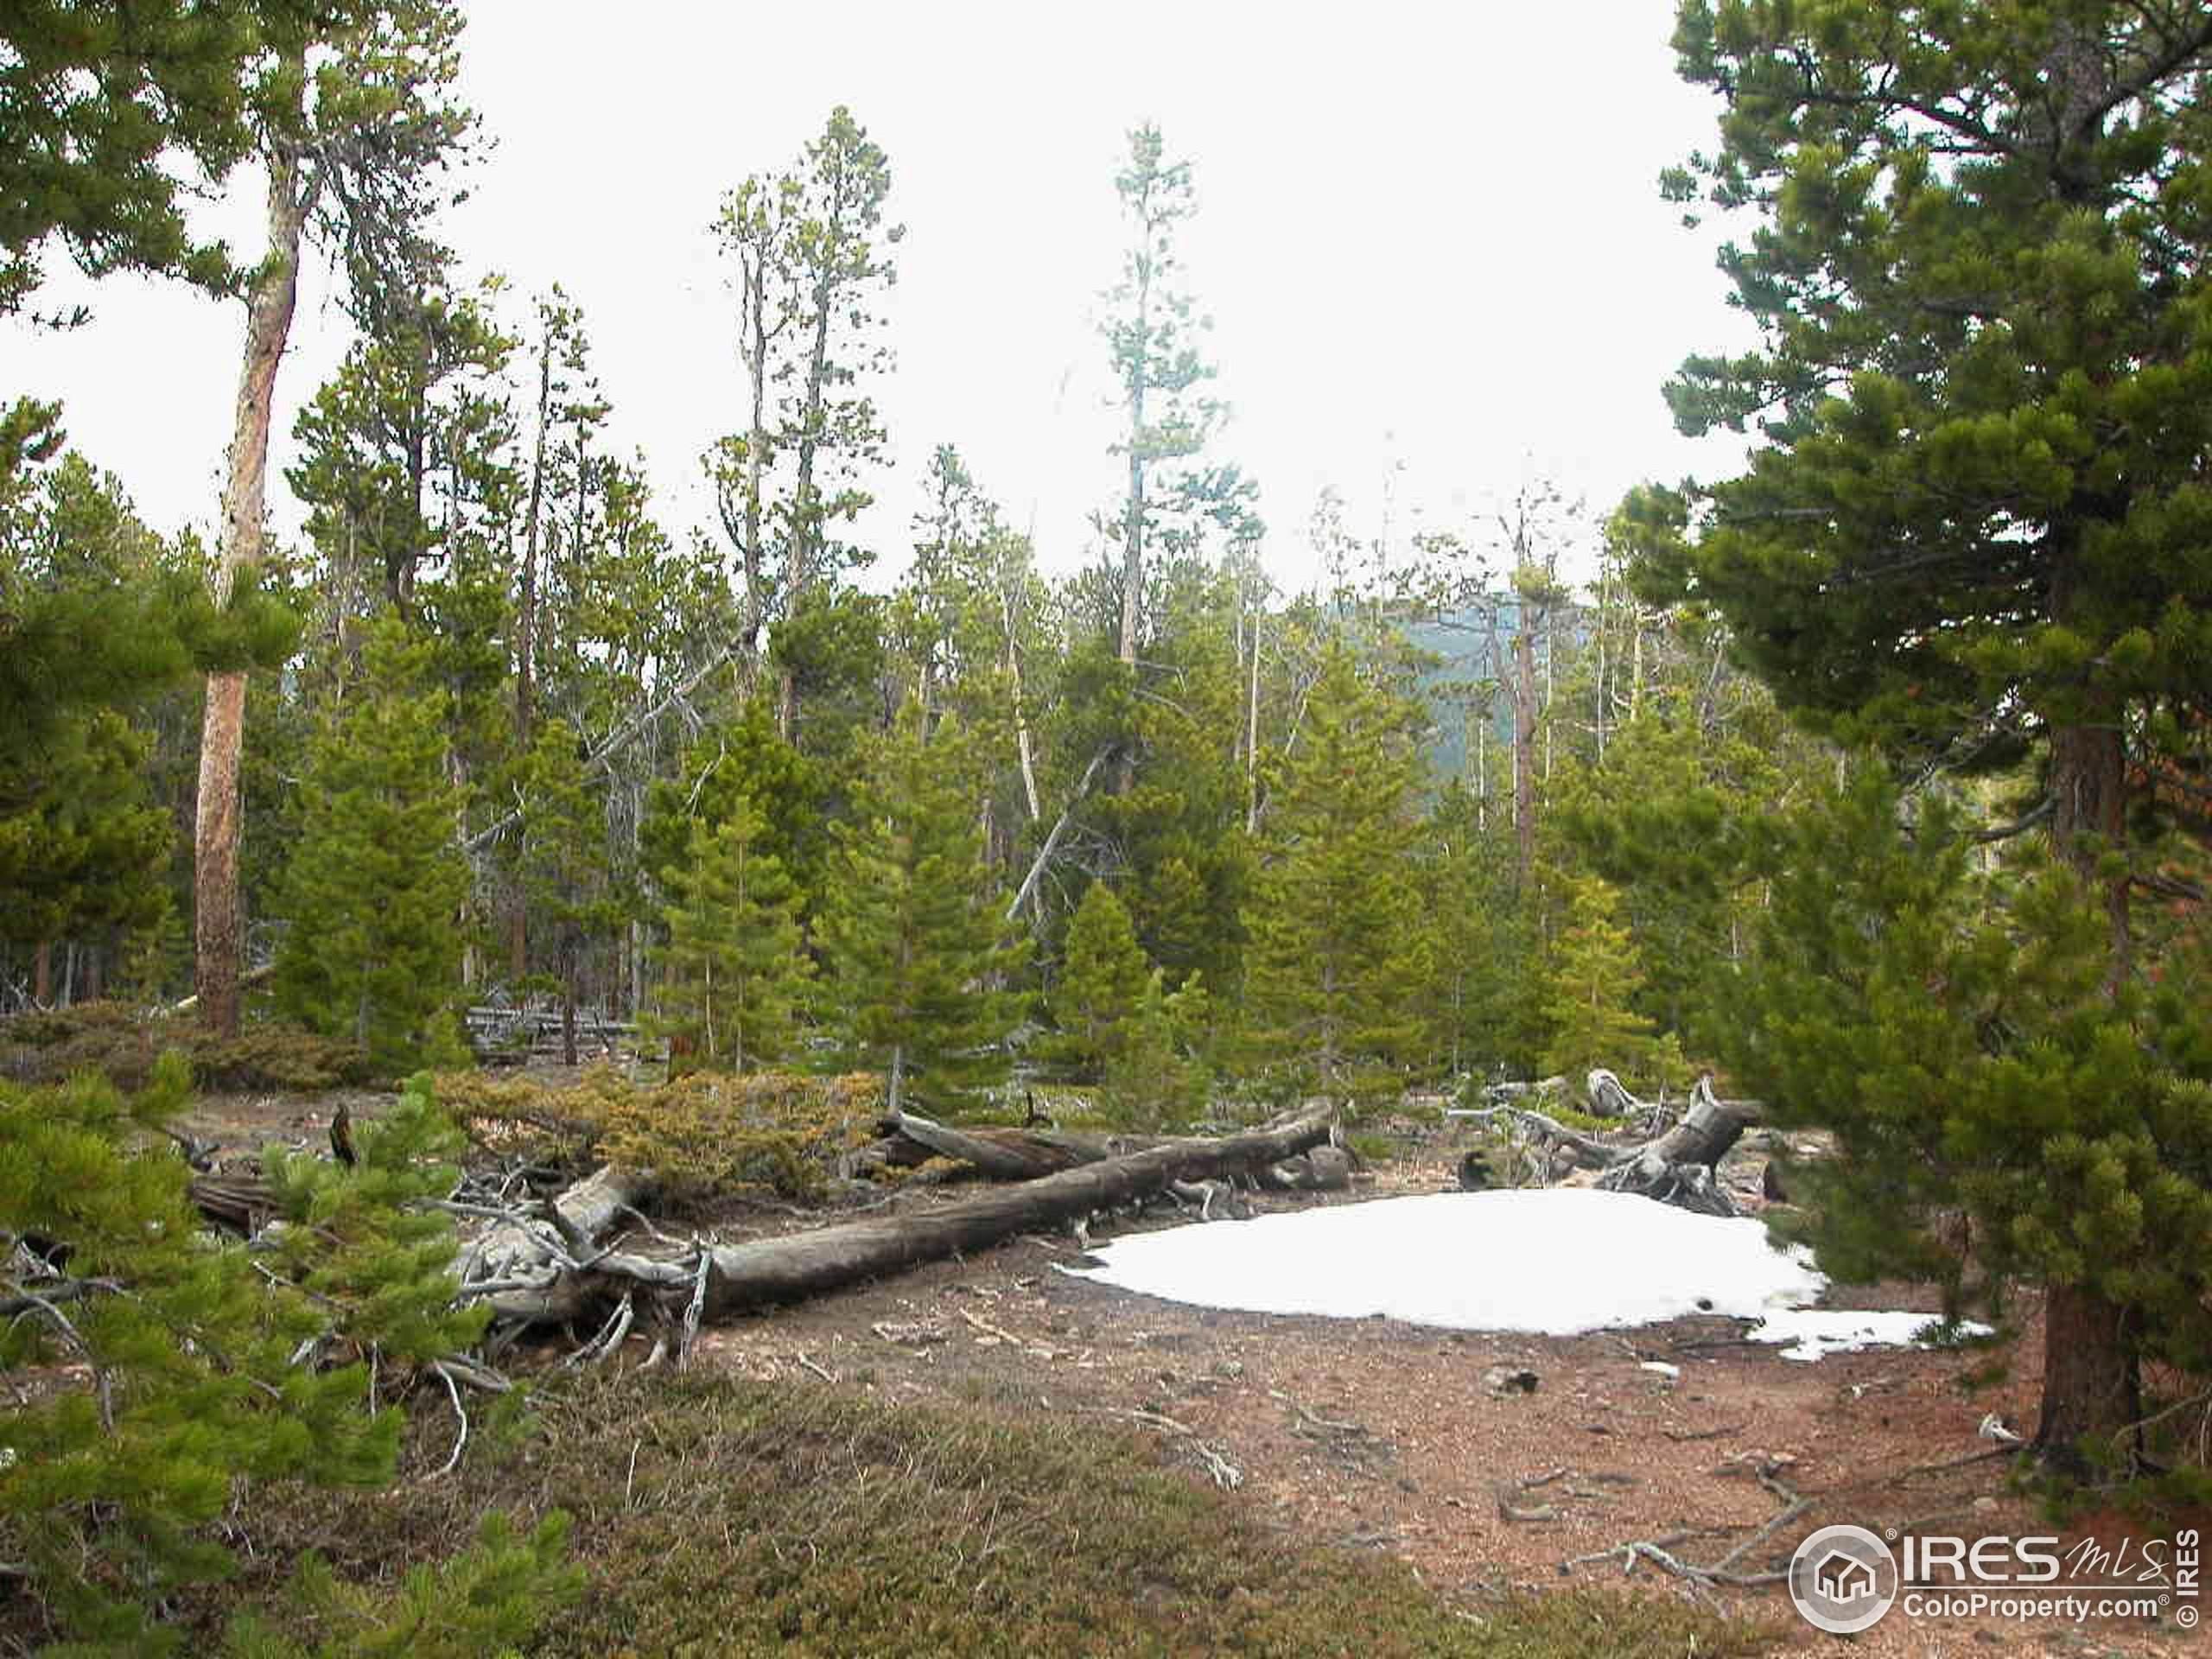 169 N 9th Ave, Brighton, CO 80601 (MLS #928948) :: Hub Real Estate